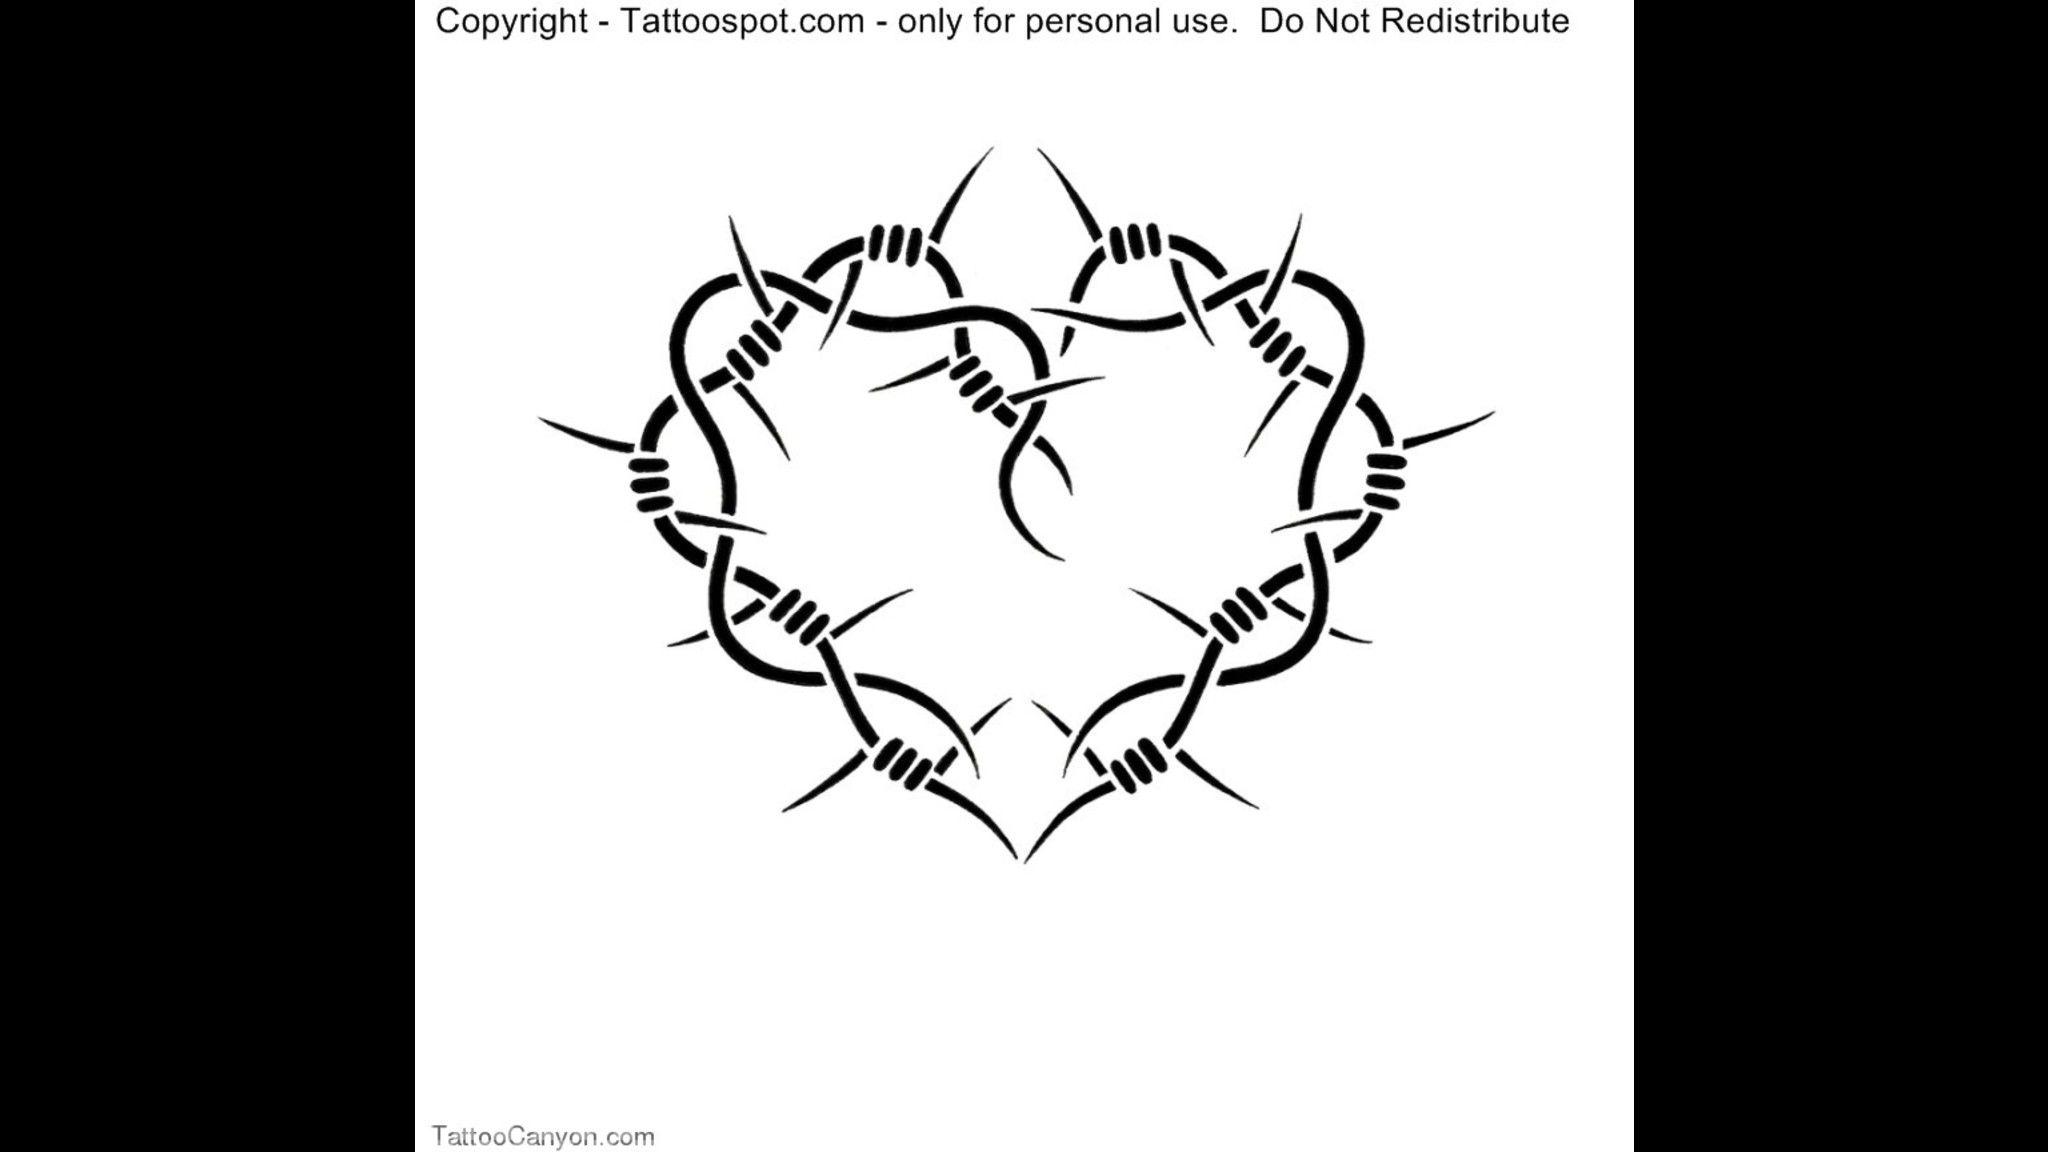 barbed wire design extra 1 barb tattoo designs free tattoo design ...